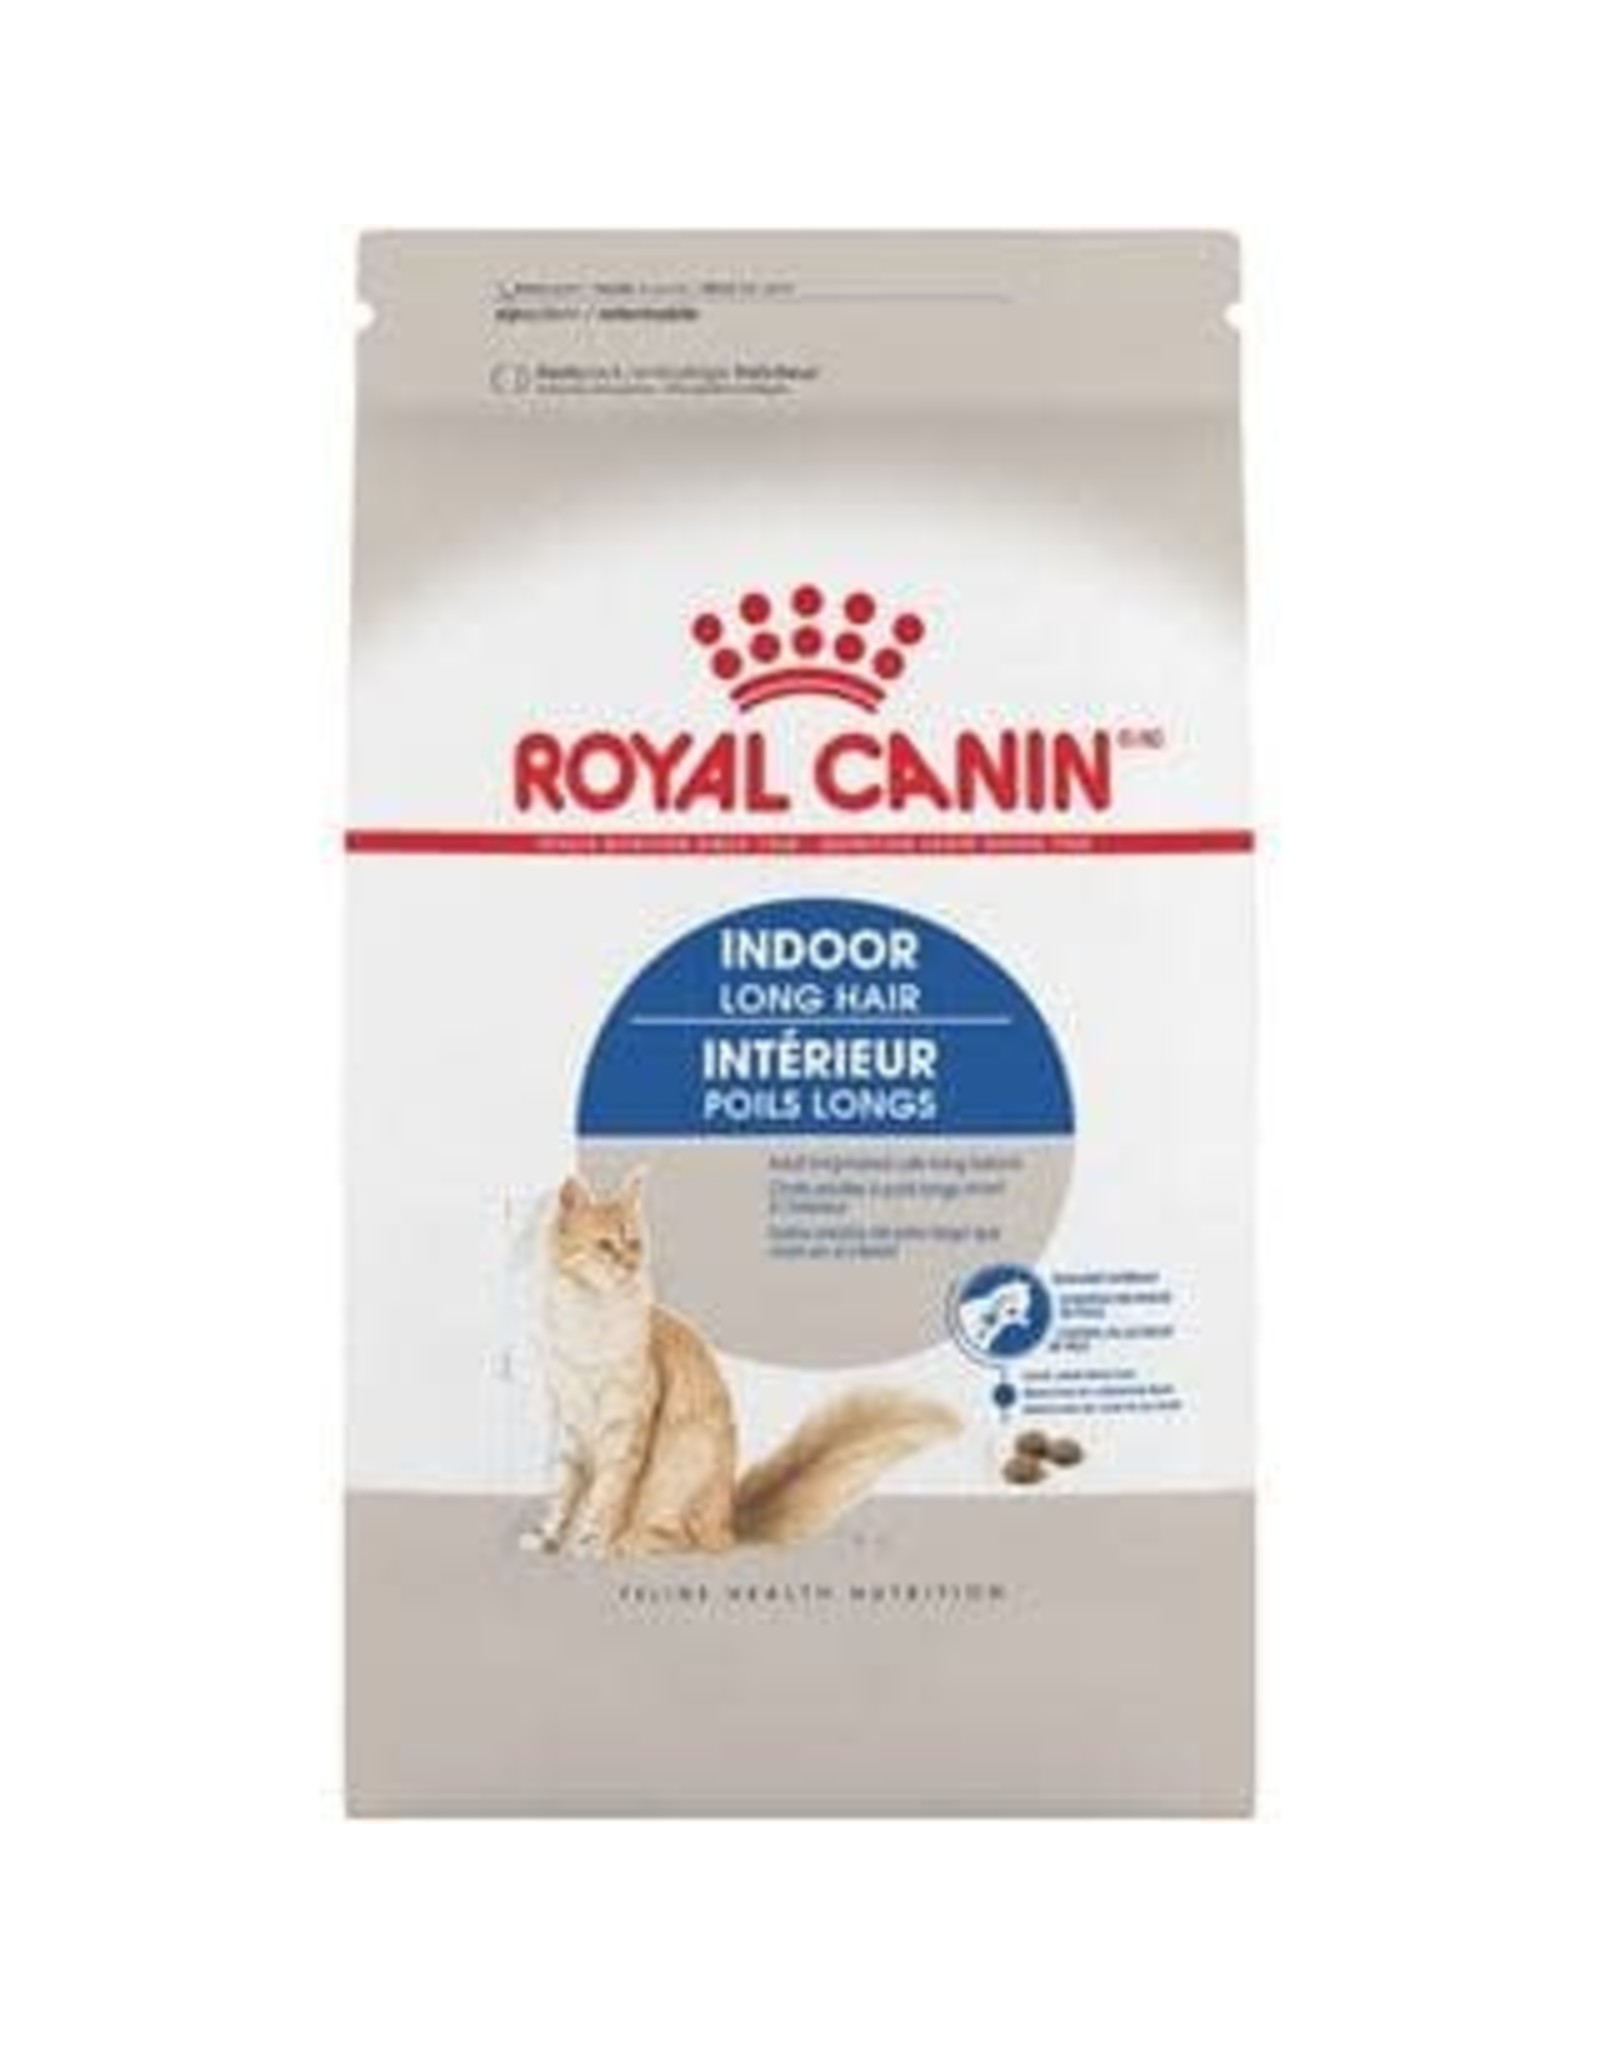 Royal Canin Royal Canin Cat - Indoor Long Hair